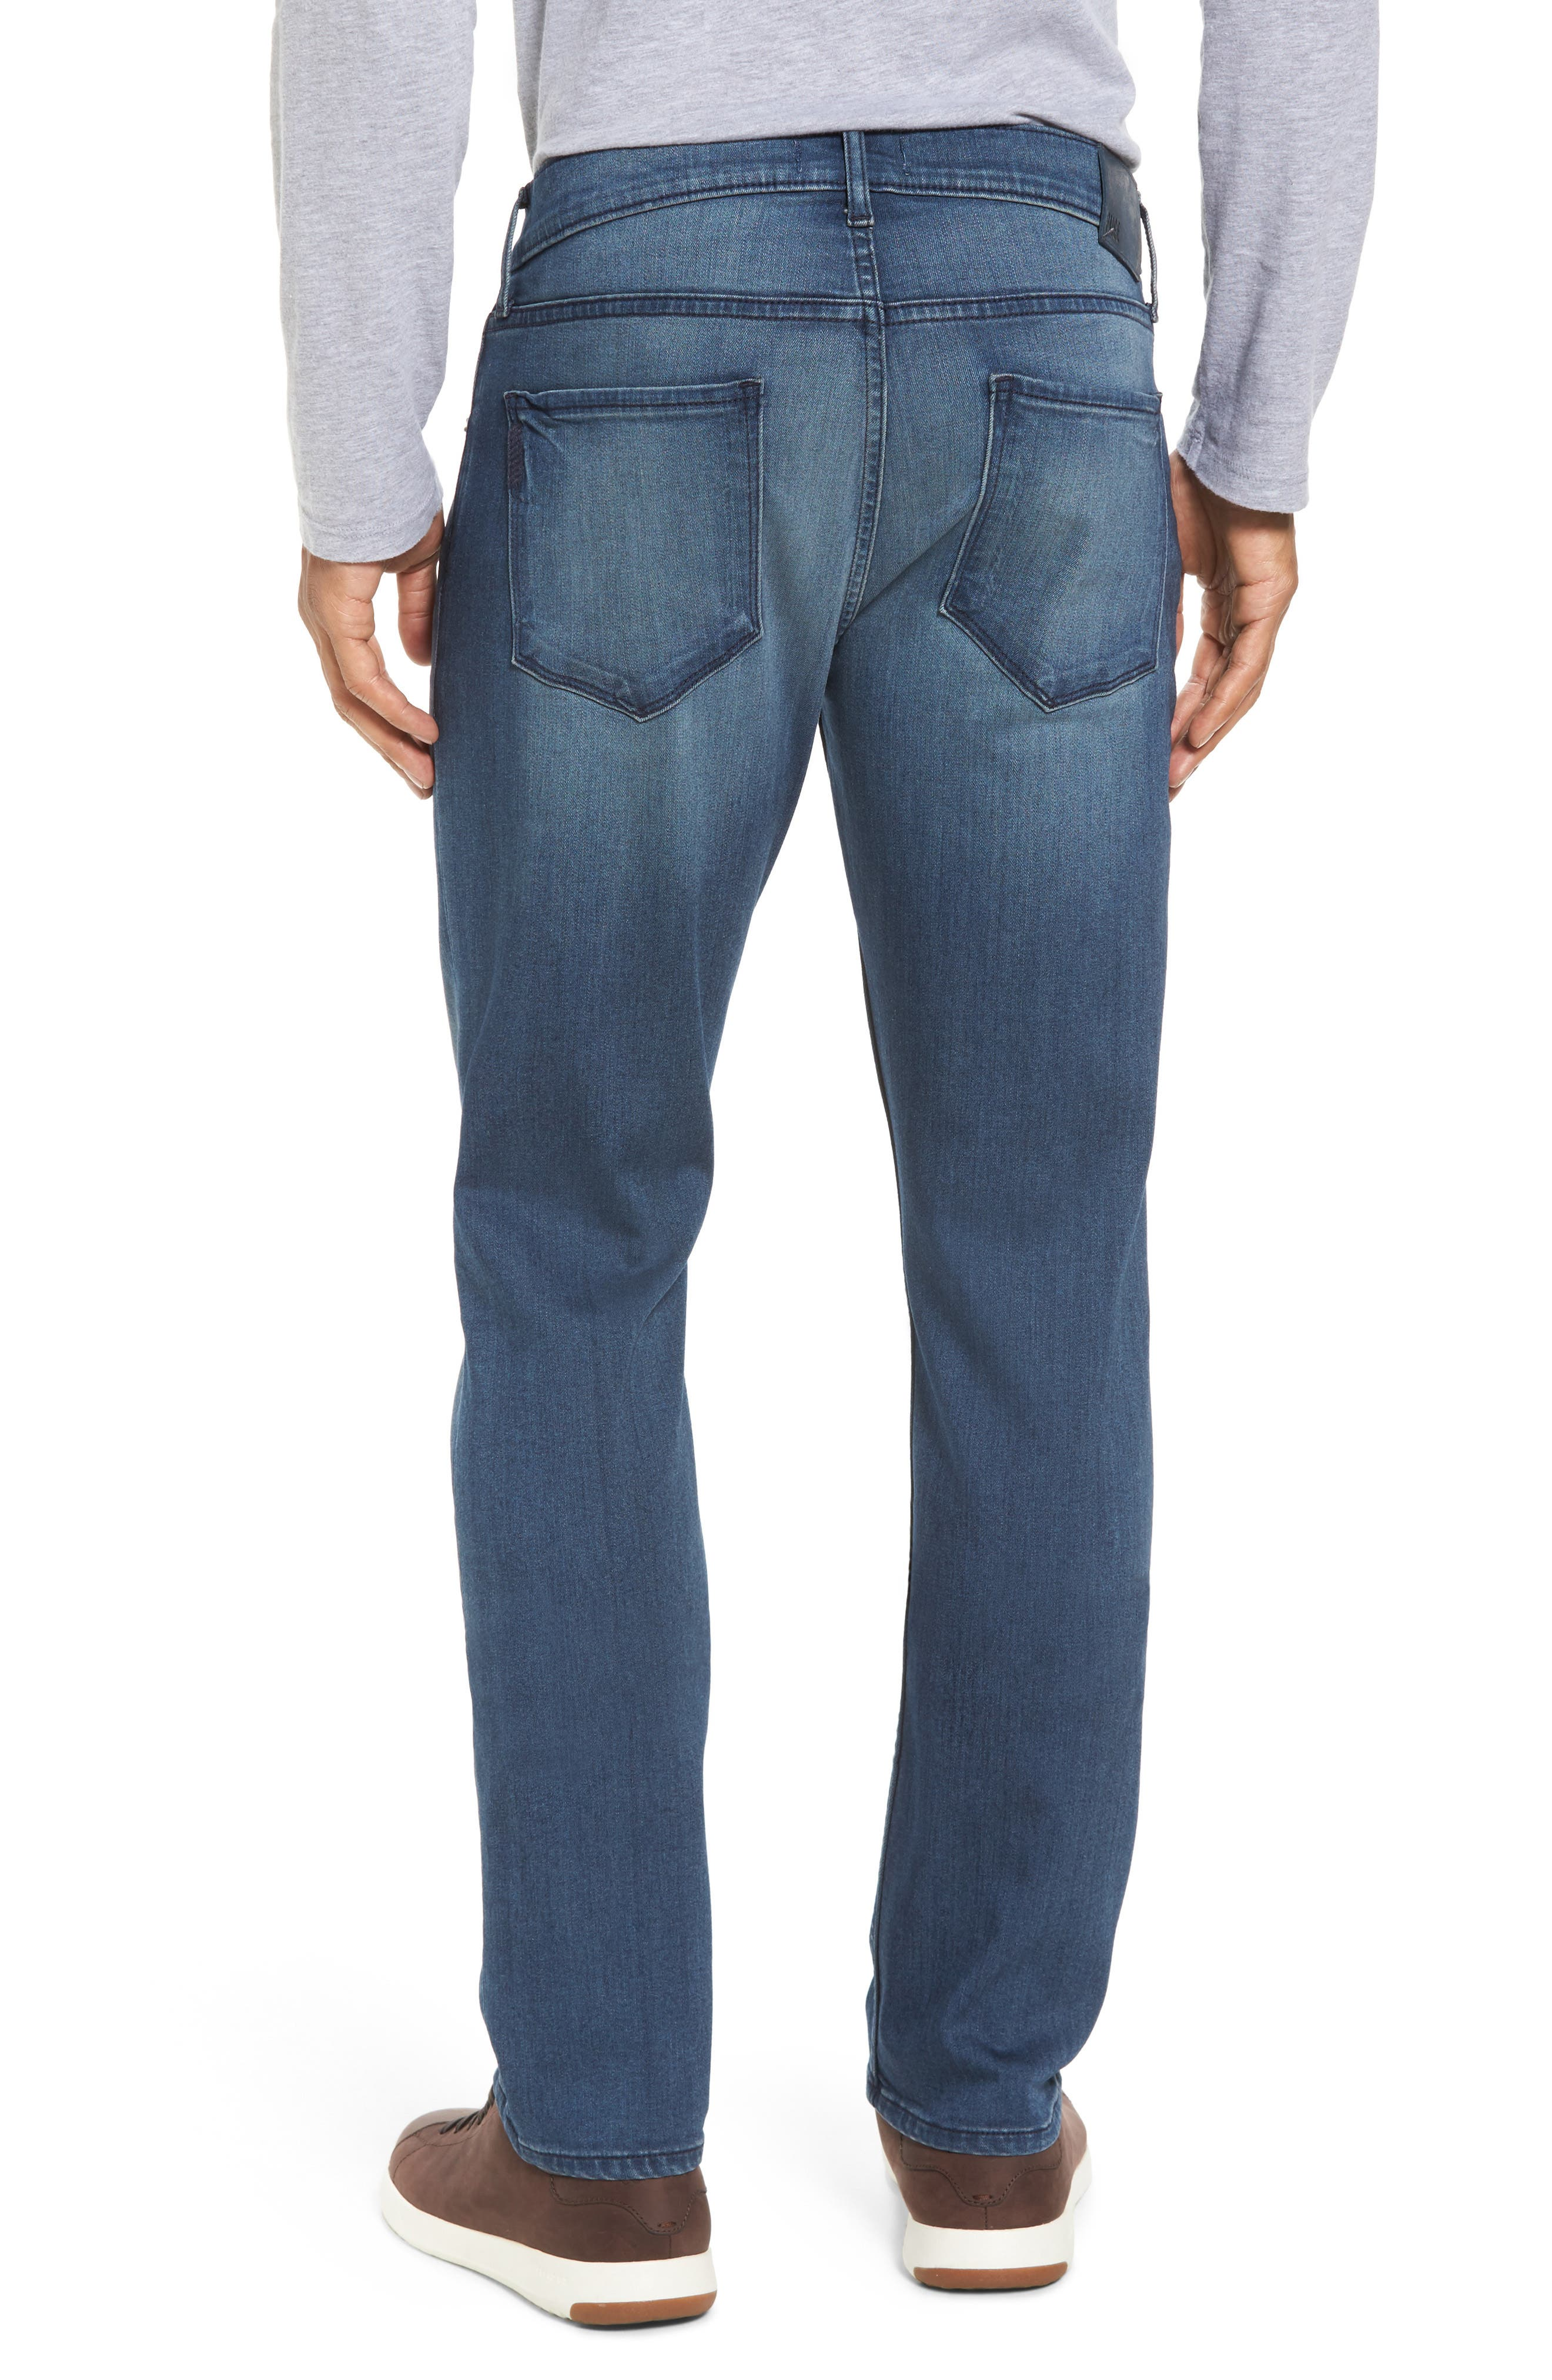 Transcend - Federal Slim Straight Fit Jeans,                             Alternate thumbnail 2, color,                             400